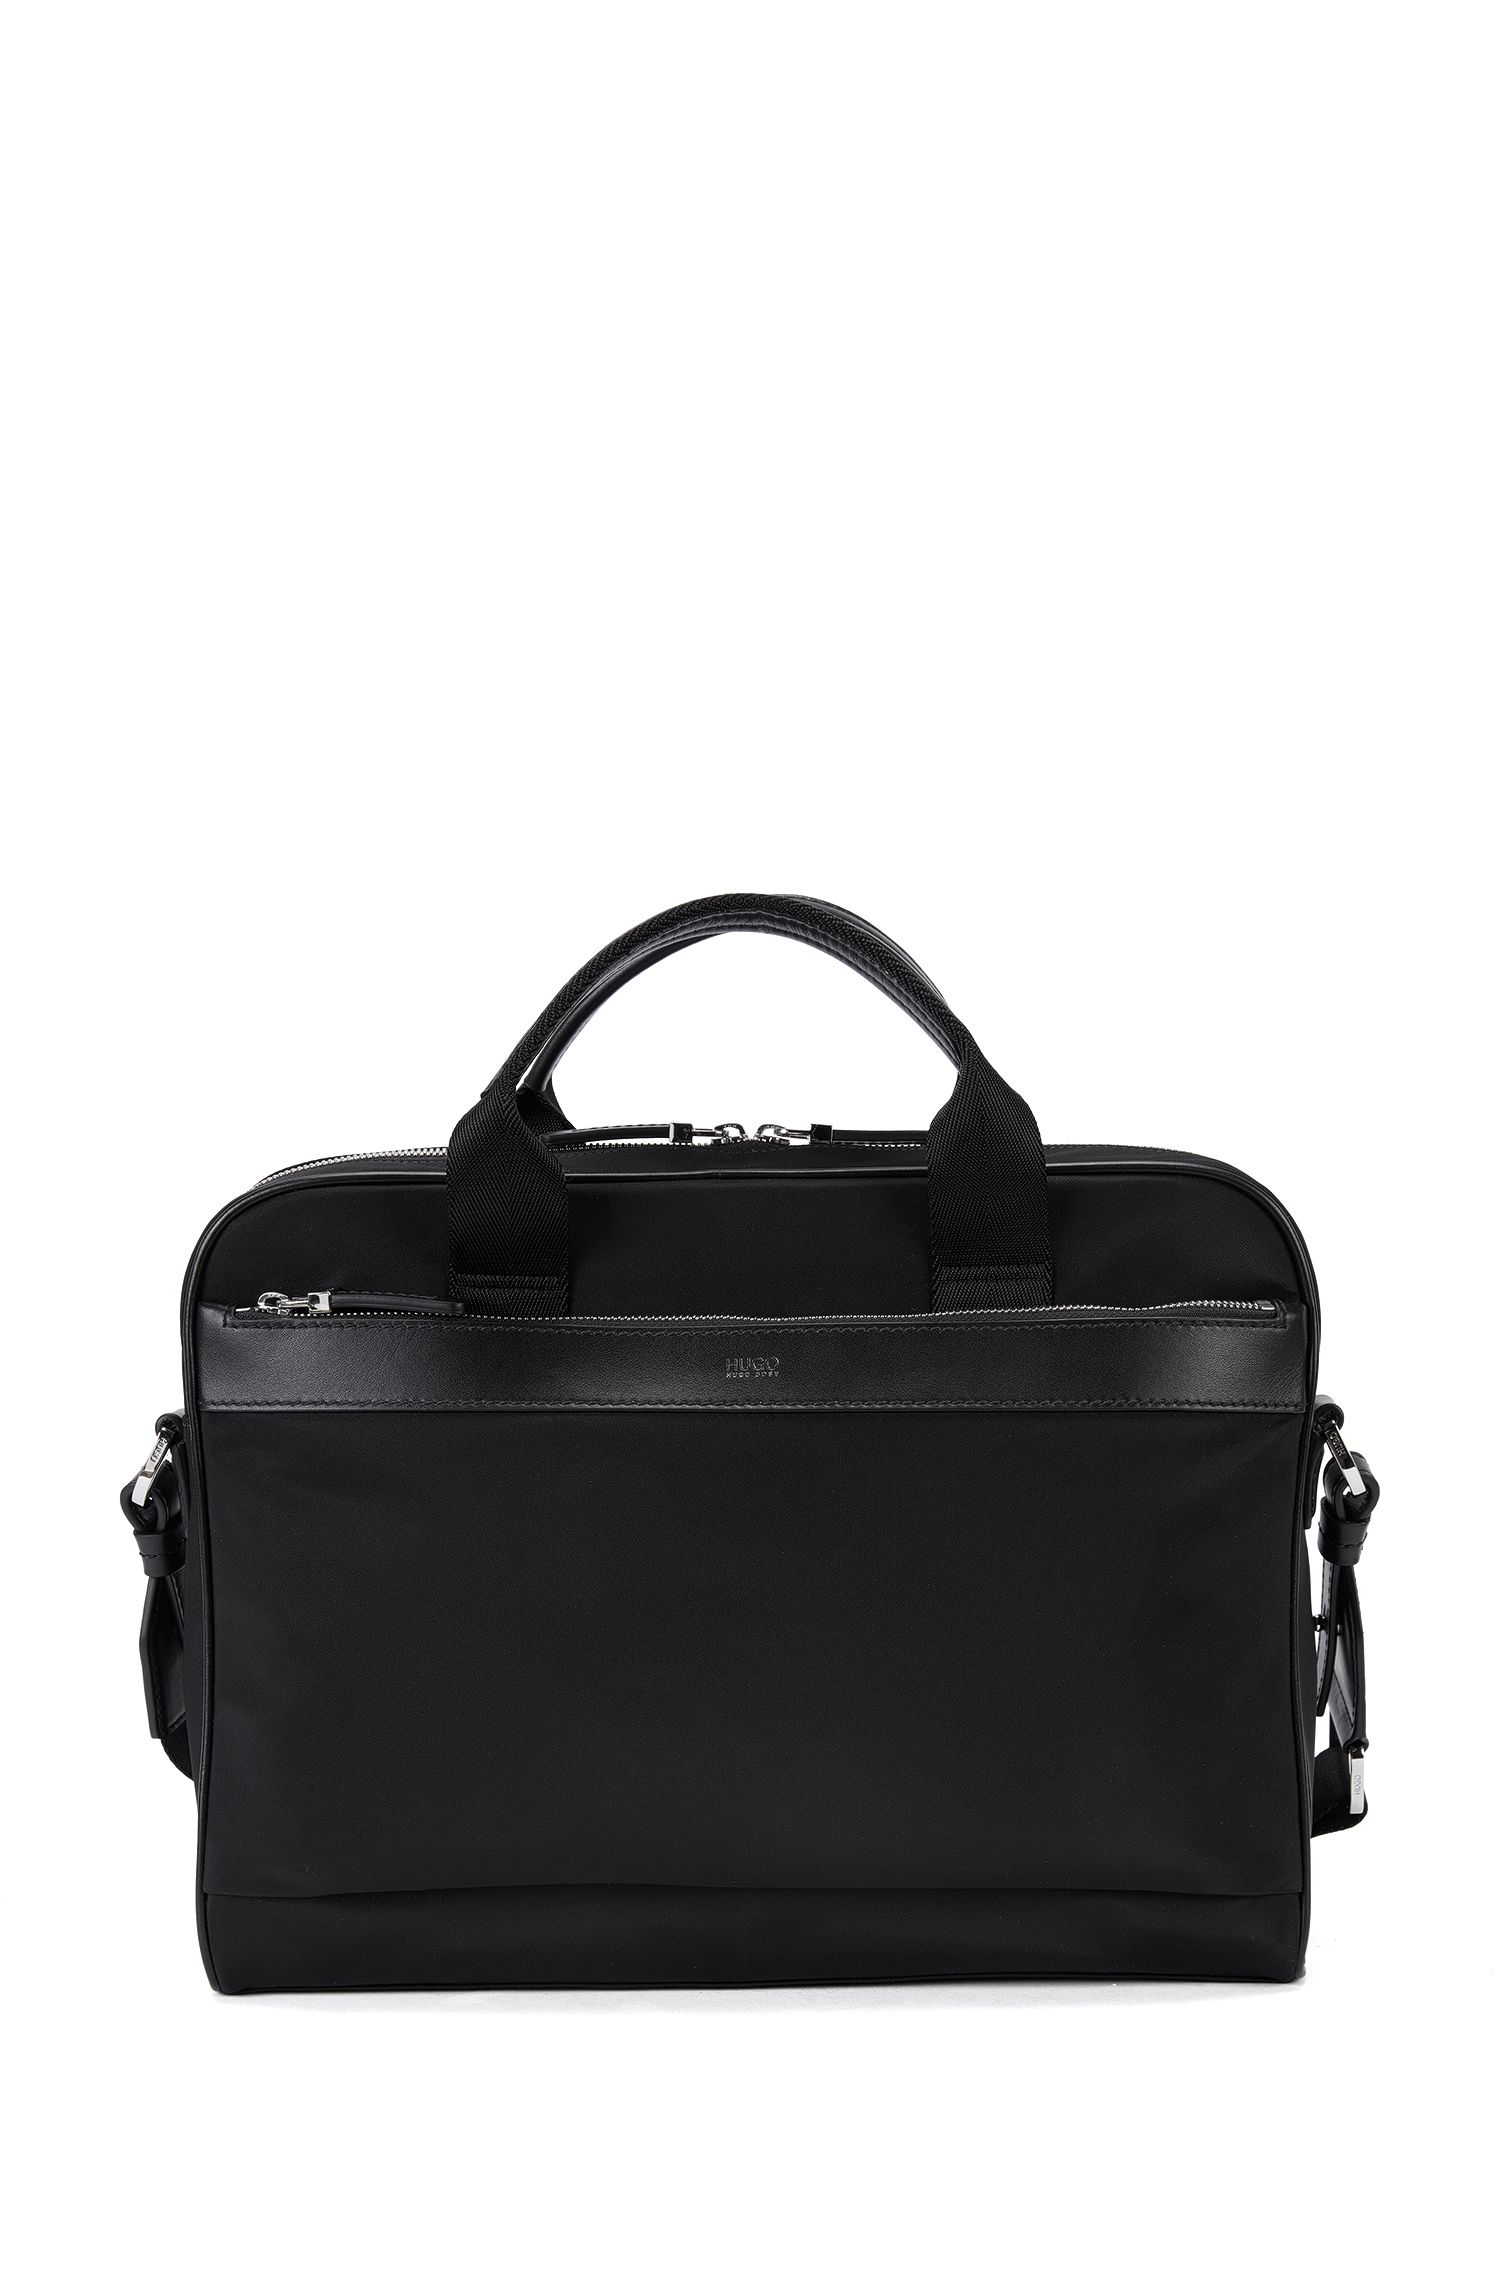 Nylon workbag with leather trim